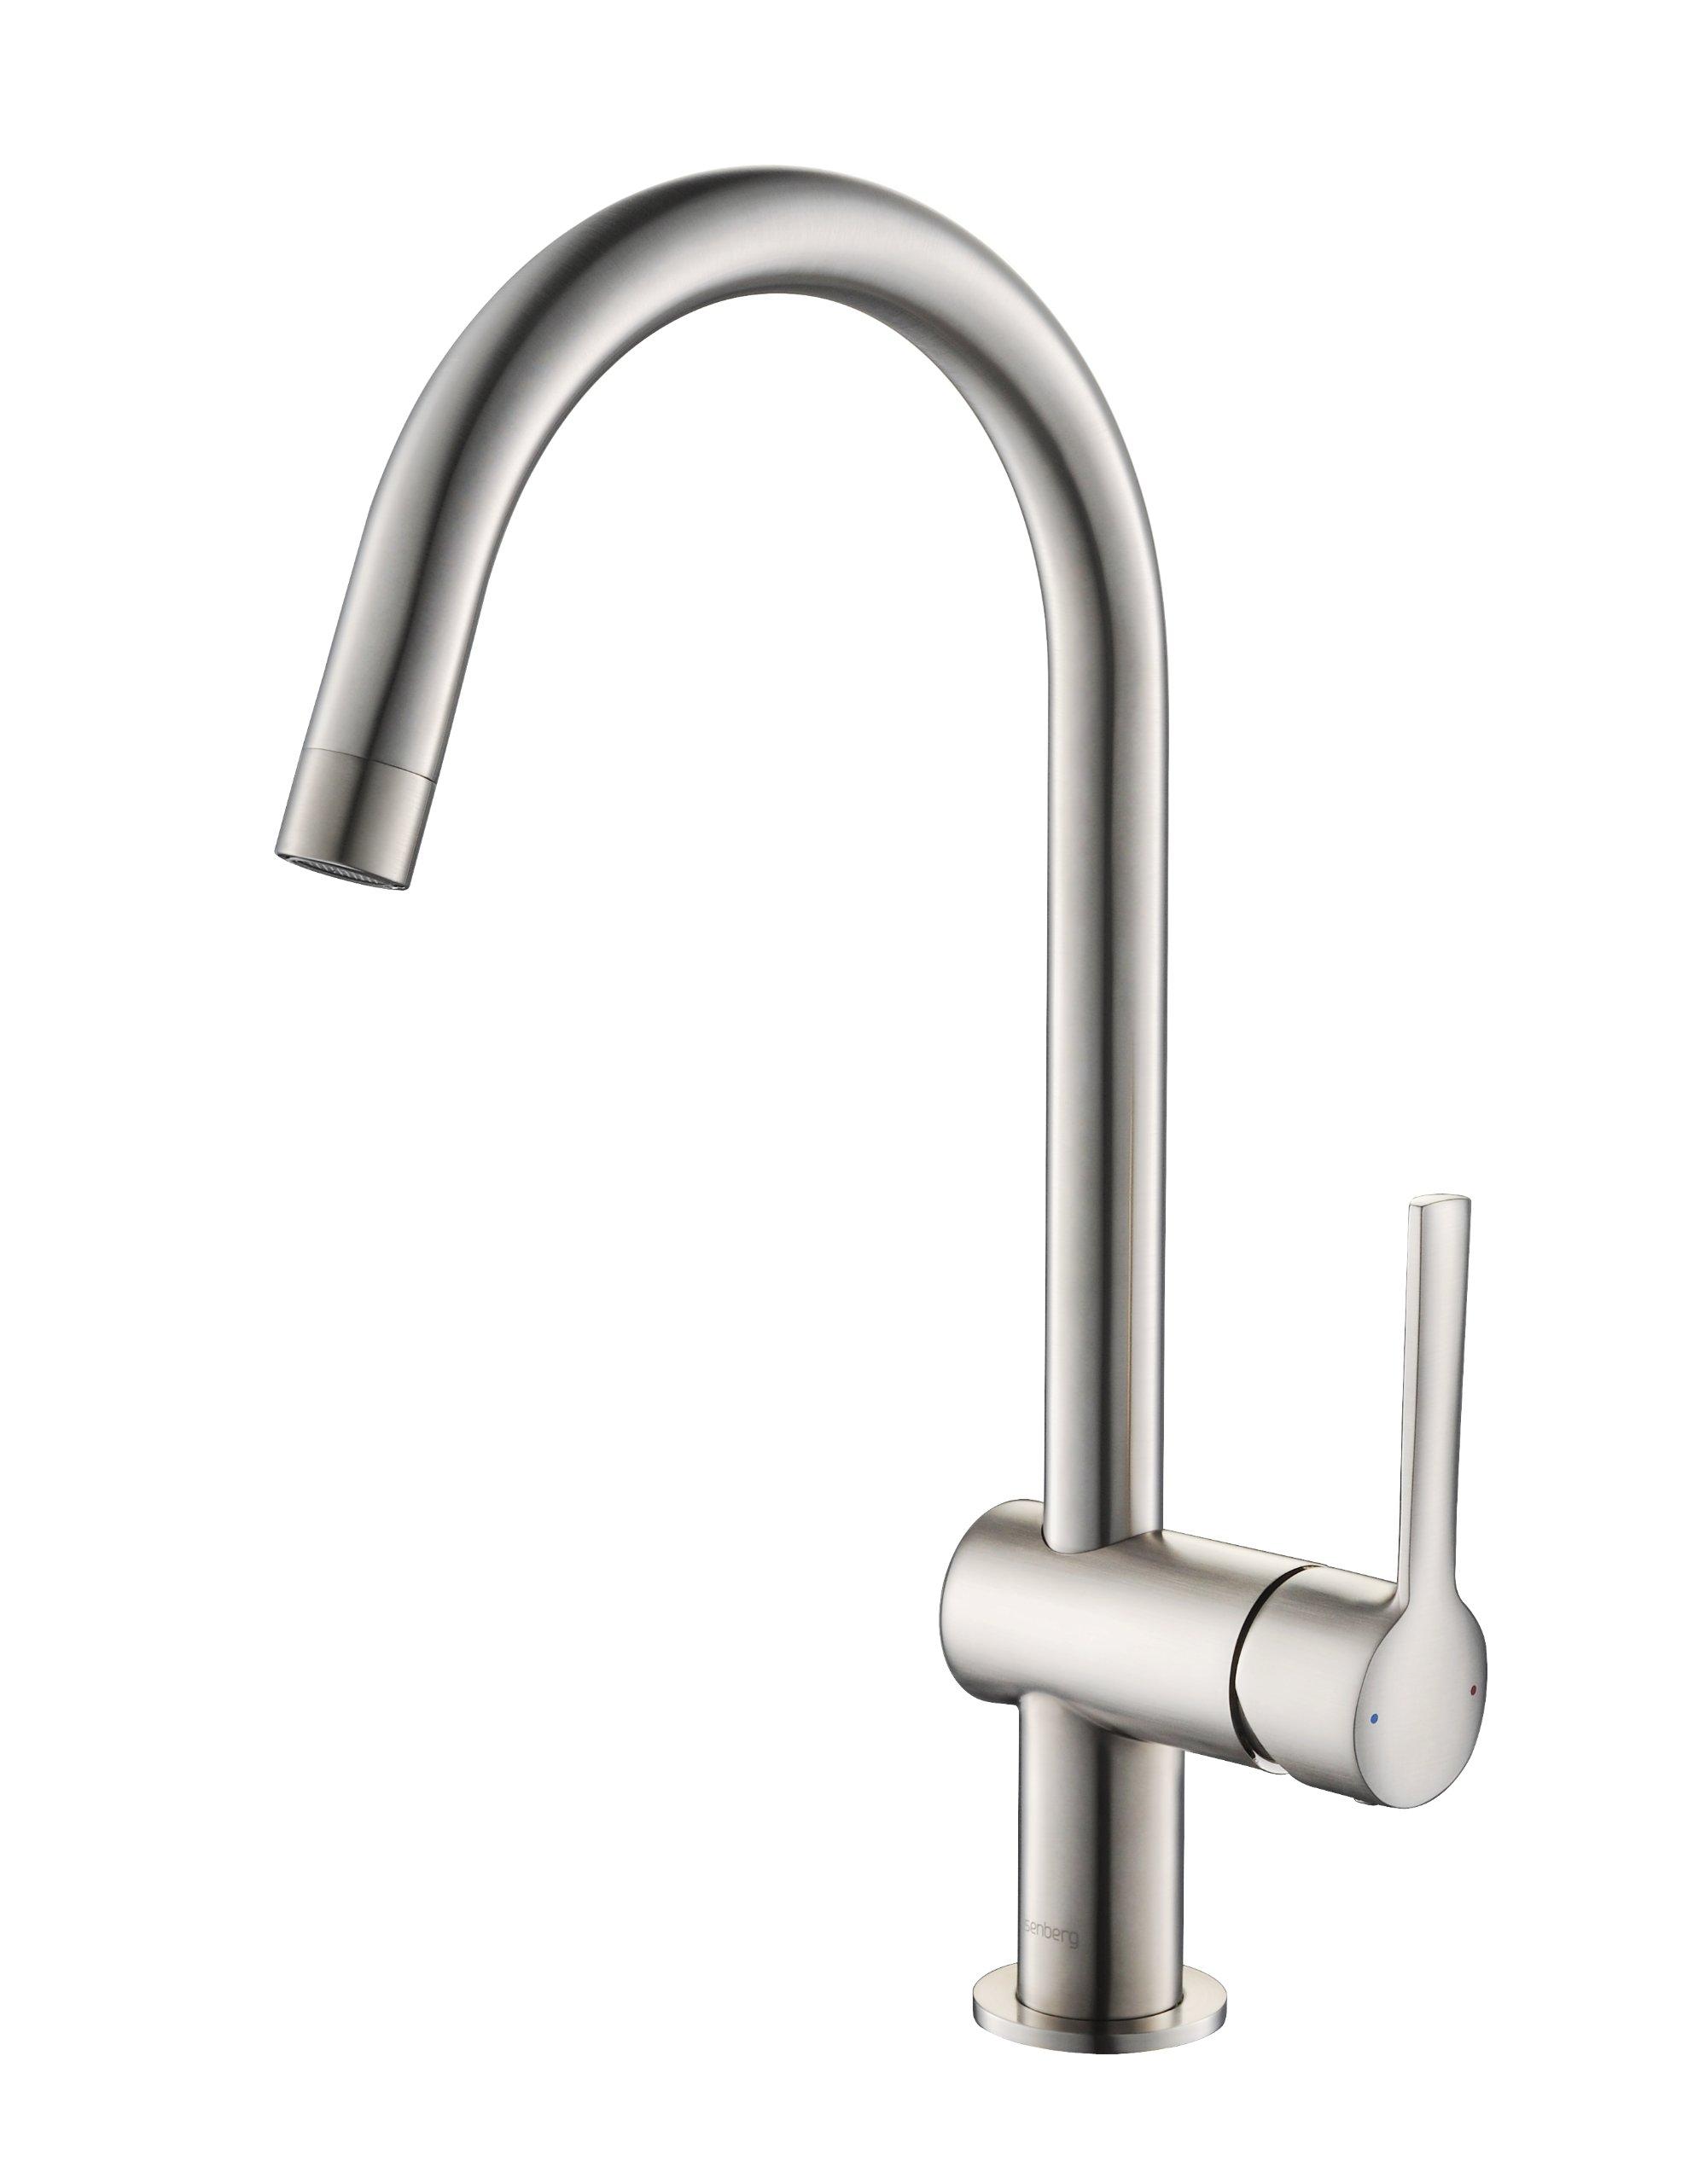 Isenberg 100.1402BN Serie 100 Kitchen / Bar Faucet, 100.1402, Brushed Nickel